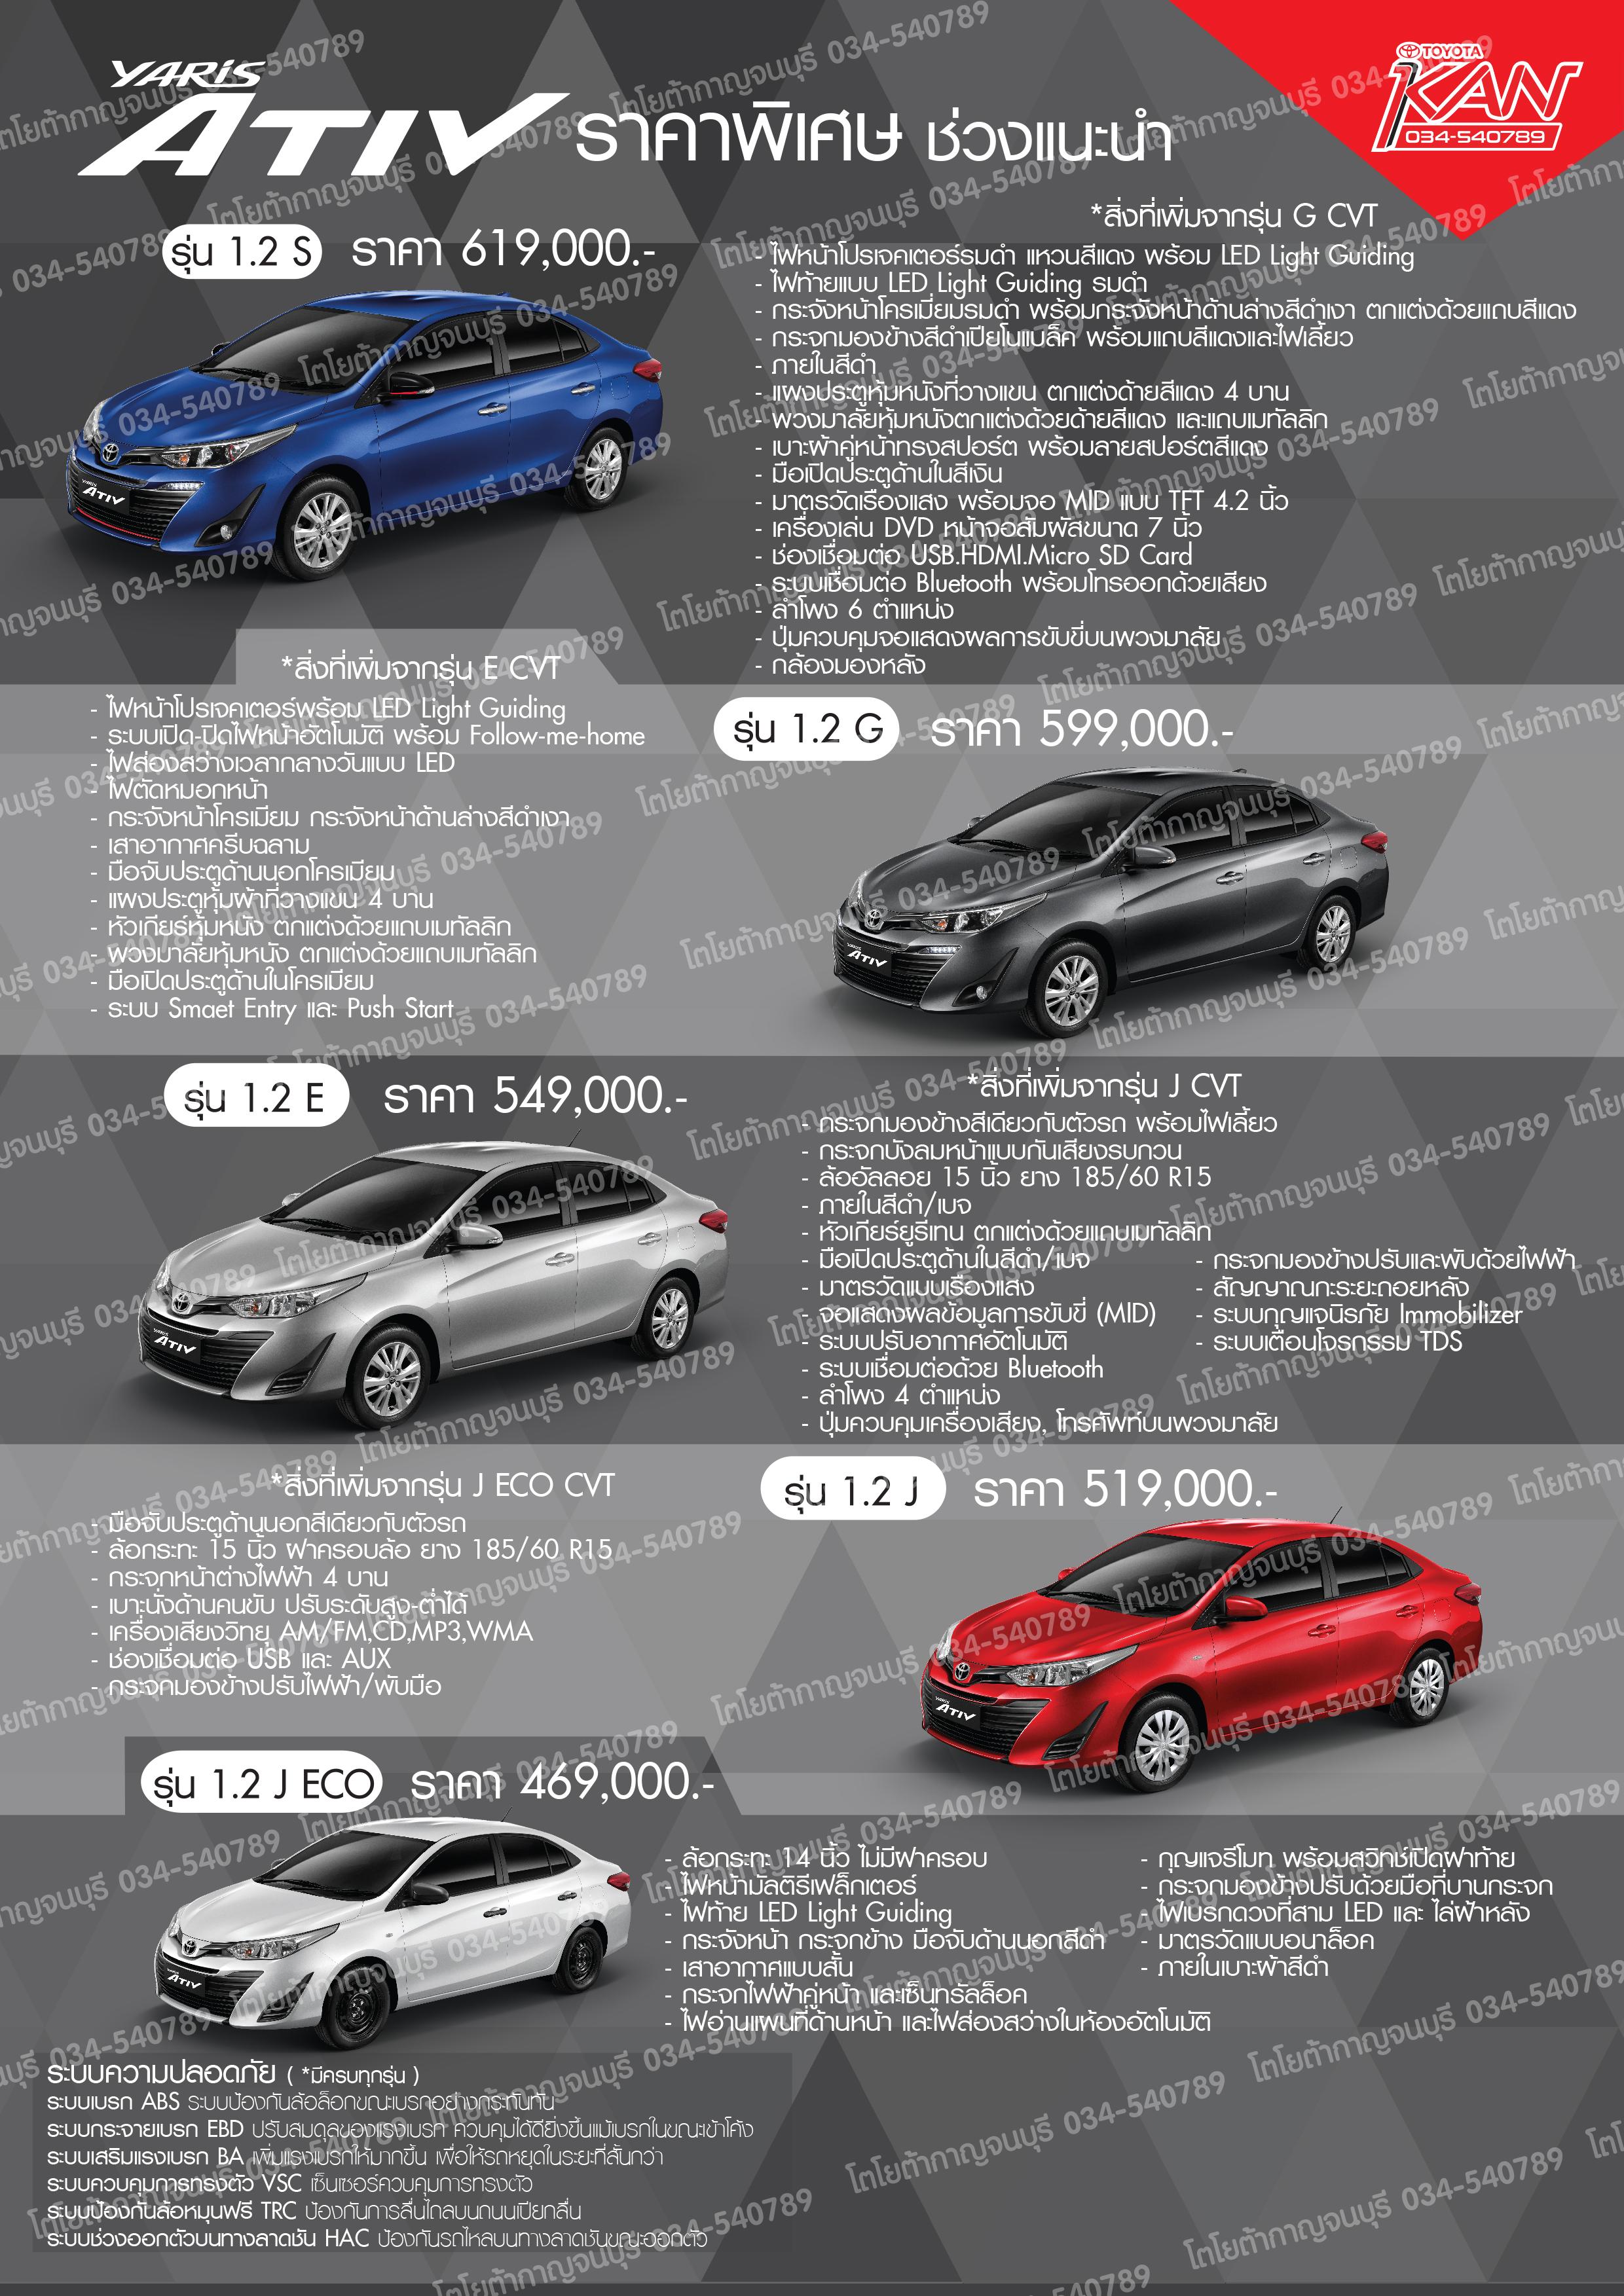 yaris-ลายน้ำ รูปโฉมใหม่กับ Toyota Yaris ATIV 2017  !!